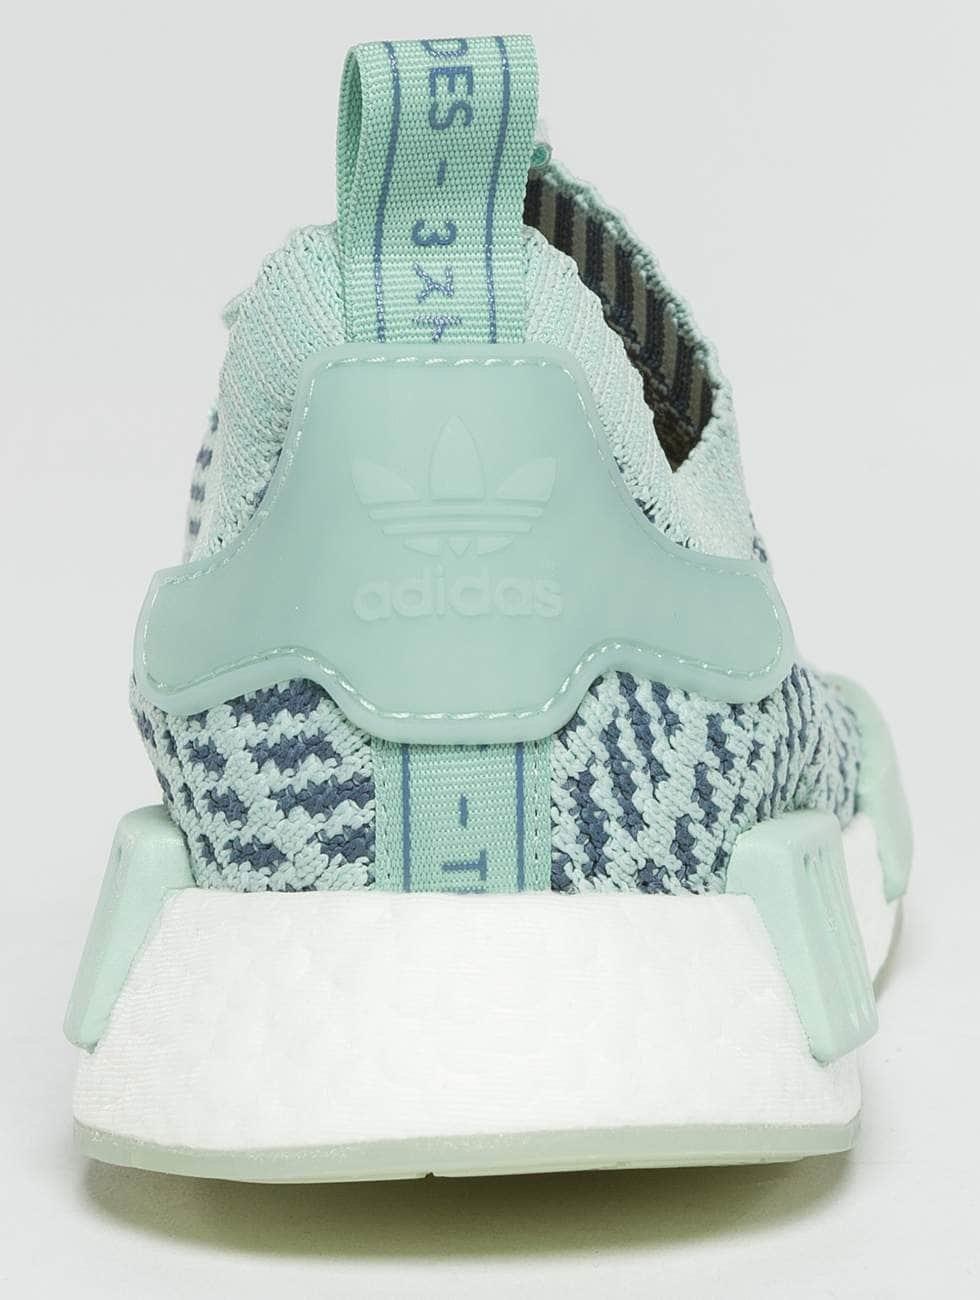 Adidas Originali Pattino / Sneaker Nmd_r1 Stlt Hp W In Verde 396 131 f6FJCDPY